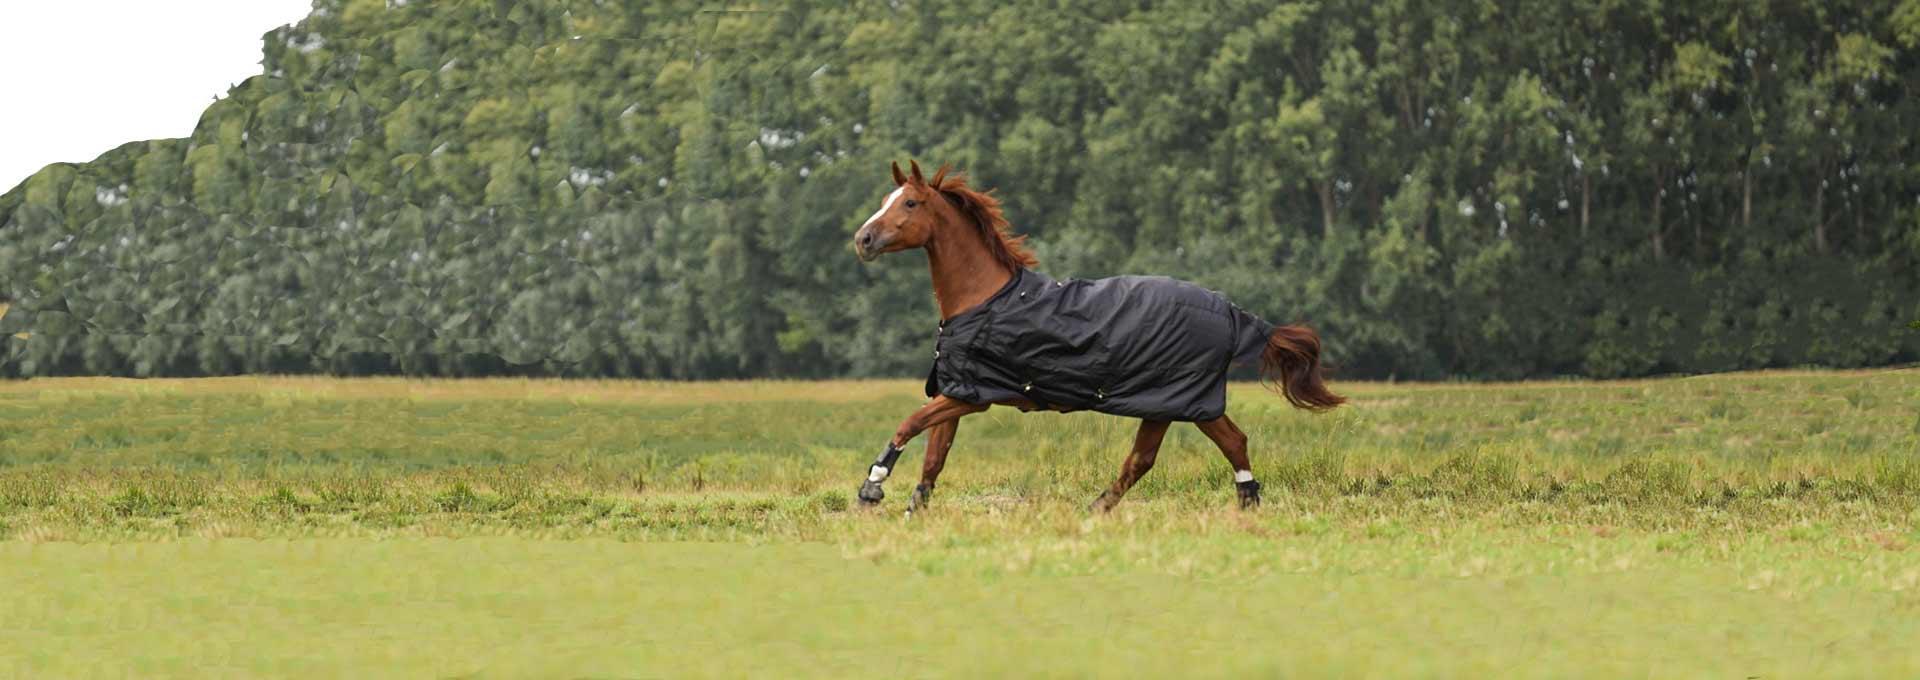 equitation decathlon couverture cheval poney